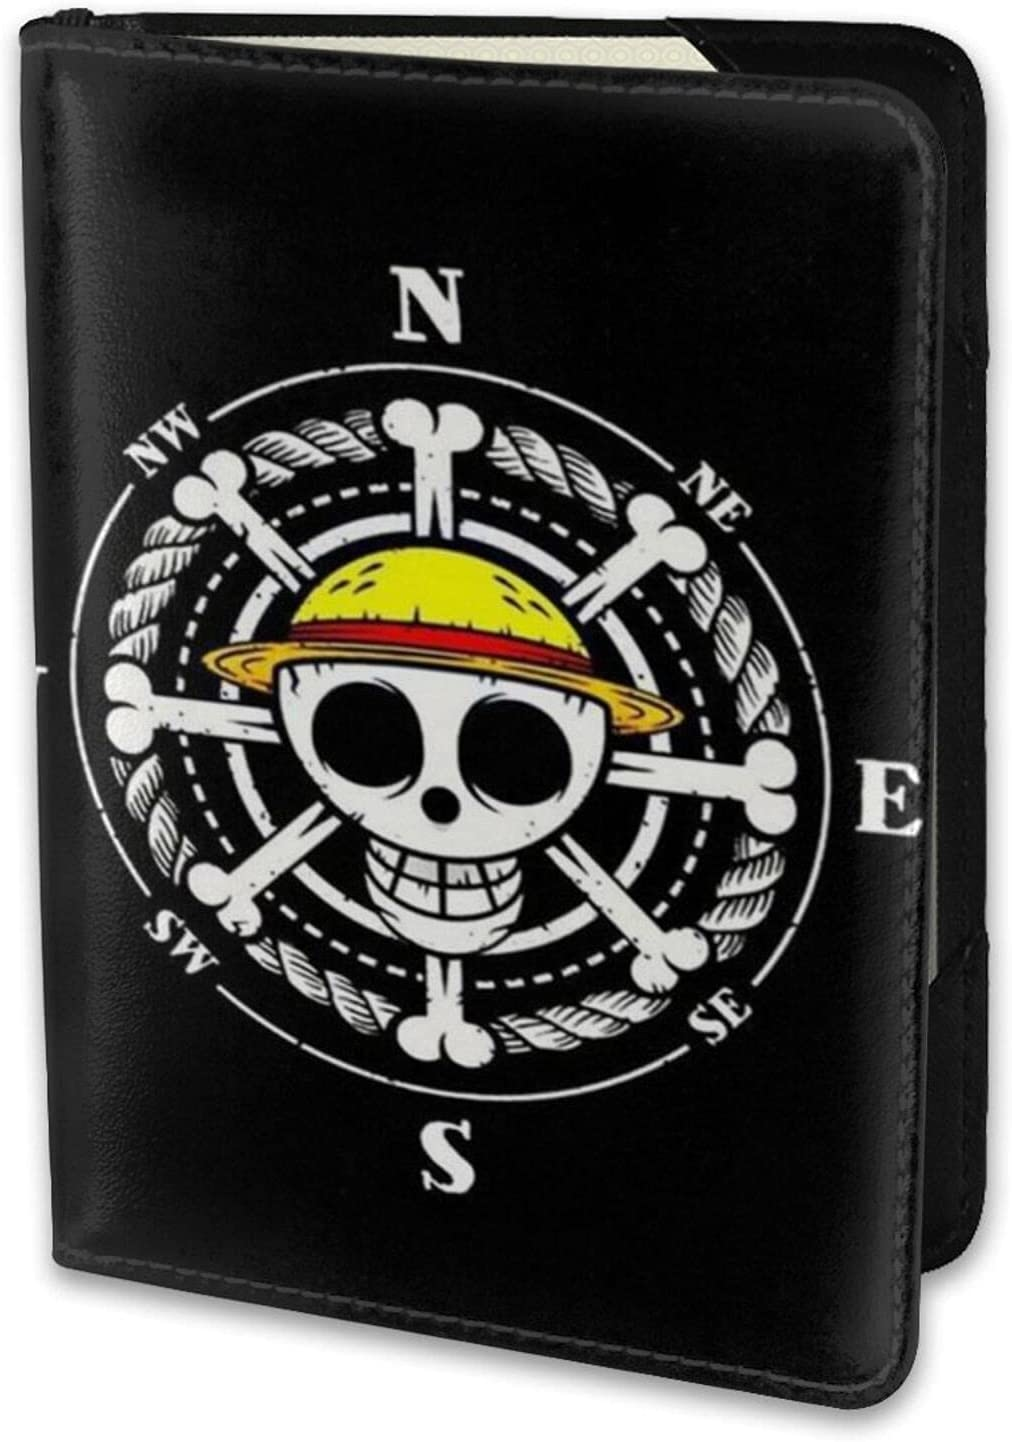 New Bombing new work Shipping Free One Piece Logo Passport Holder Pass Essentials Airplane Travel